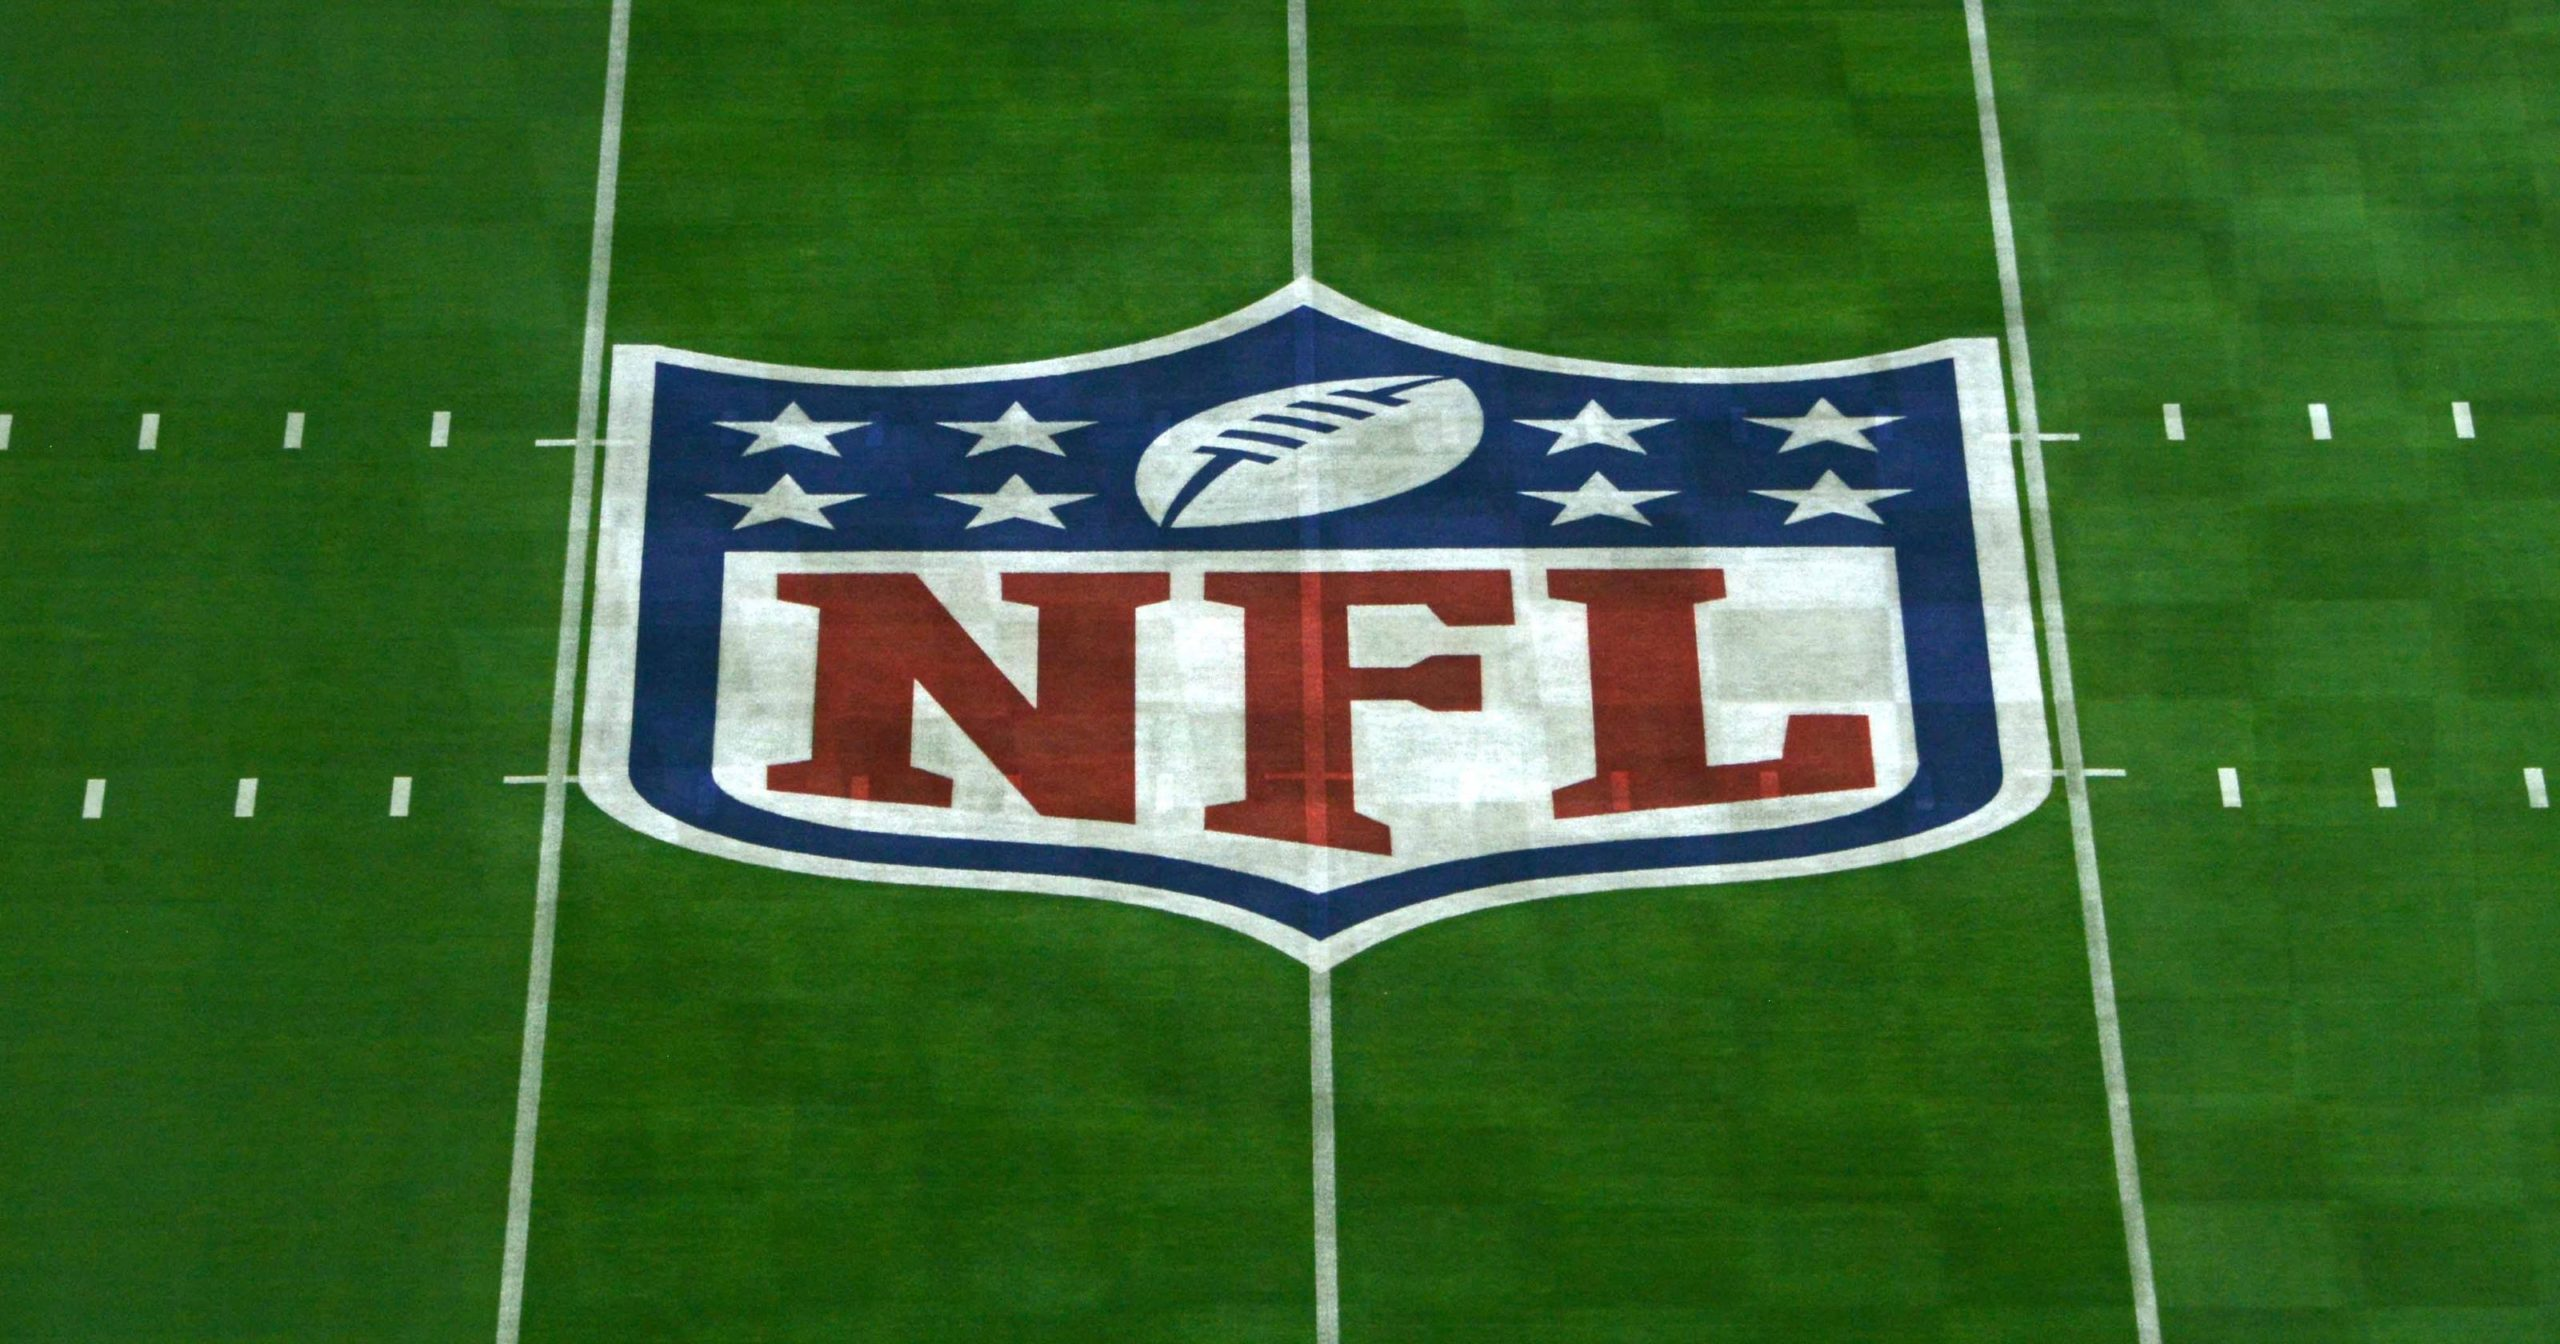 NFL-Logo-field-1-scaled.jpg?fit=2560%2C1344&ssl=1